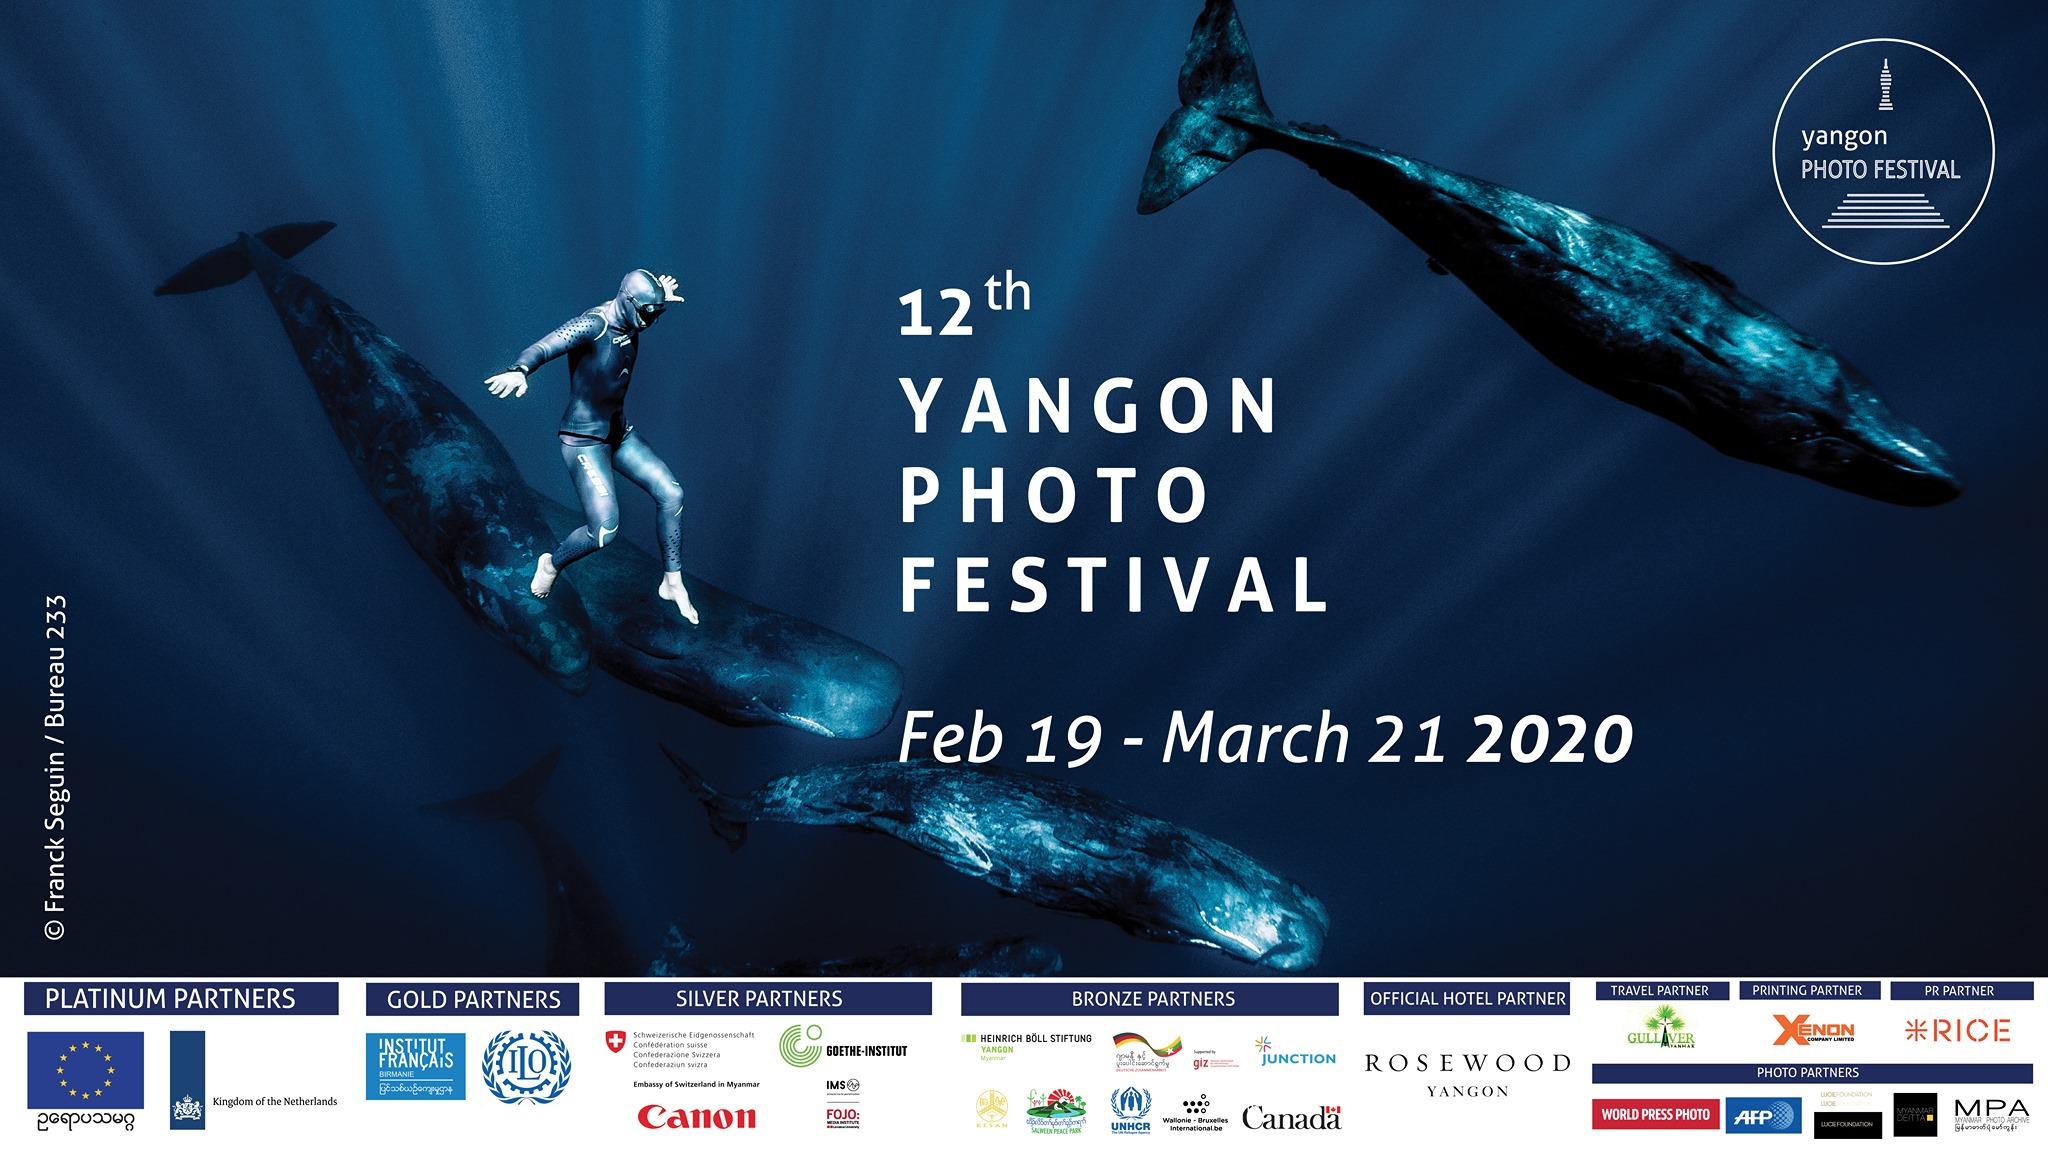 12th Yangon Photo Festival